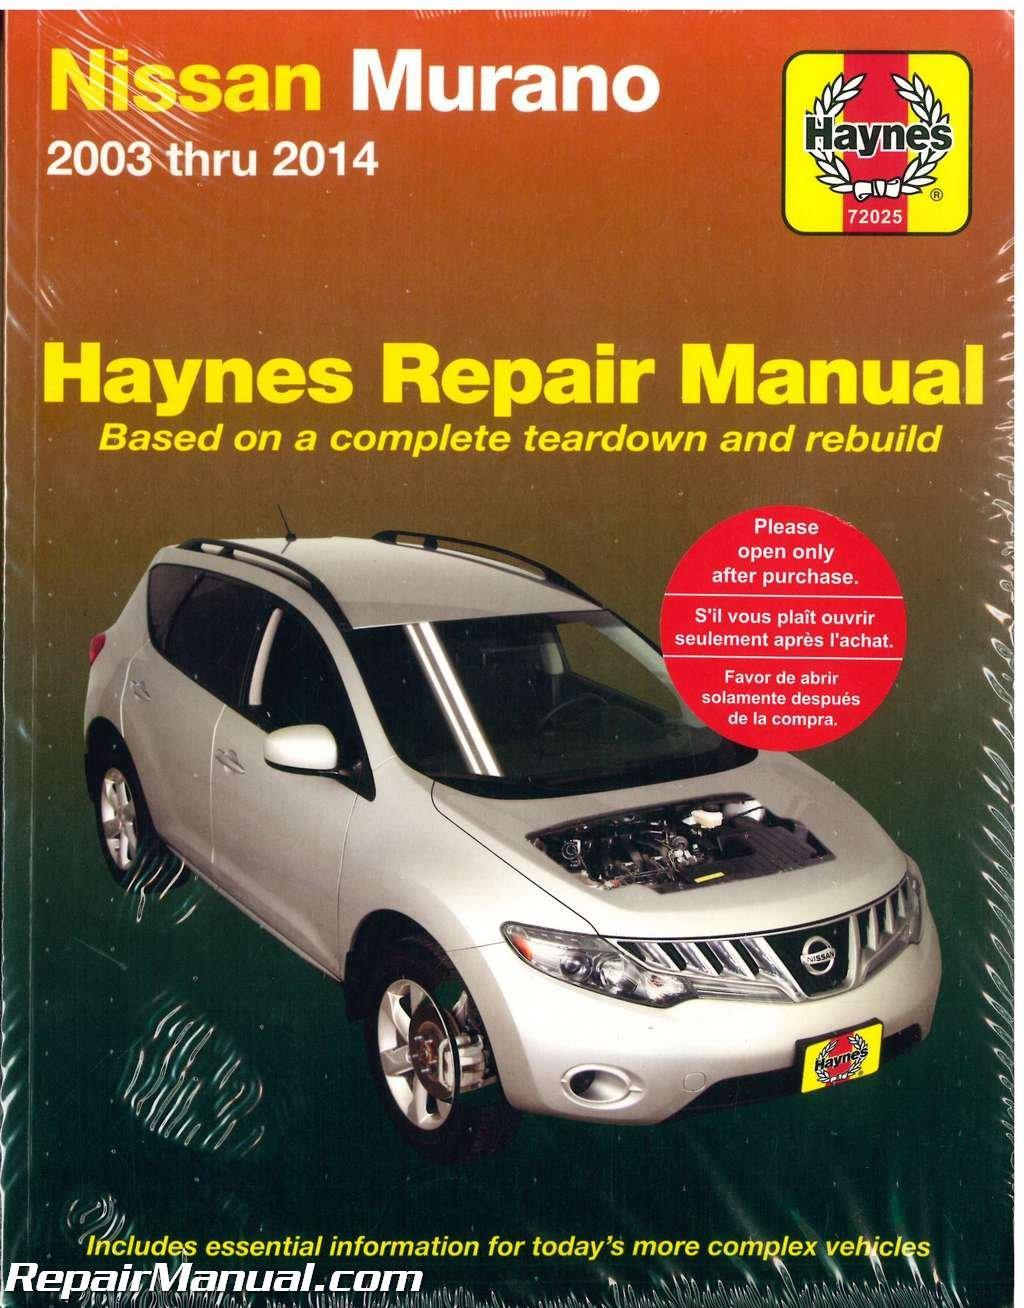 Amazon.com: H72025 Nissan Murano 2003-2014 SUV Haynes Repair Service Manual:  Manufacturer: Automotive